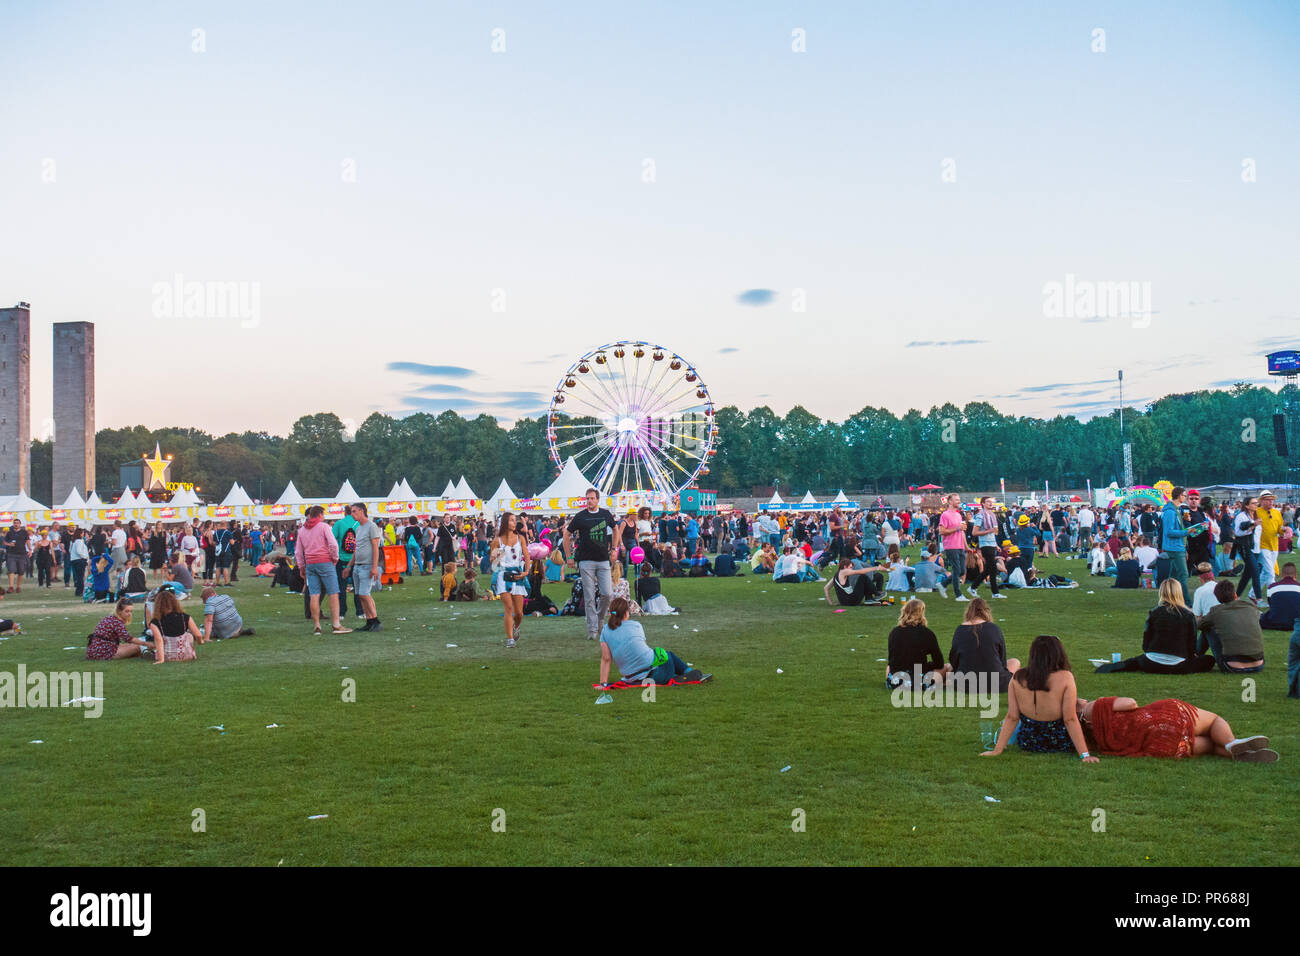 Berlin Lollapalooza music festival 2018 - Stock Image